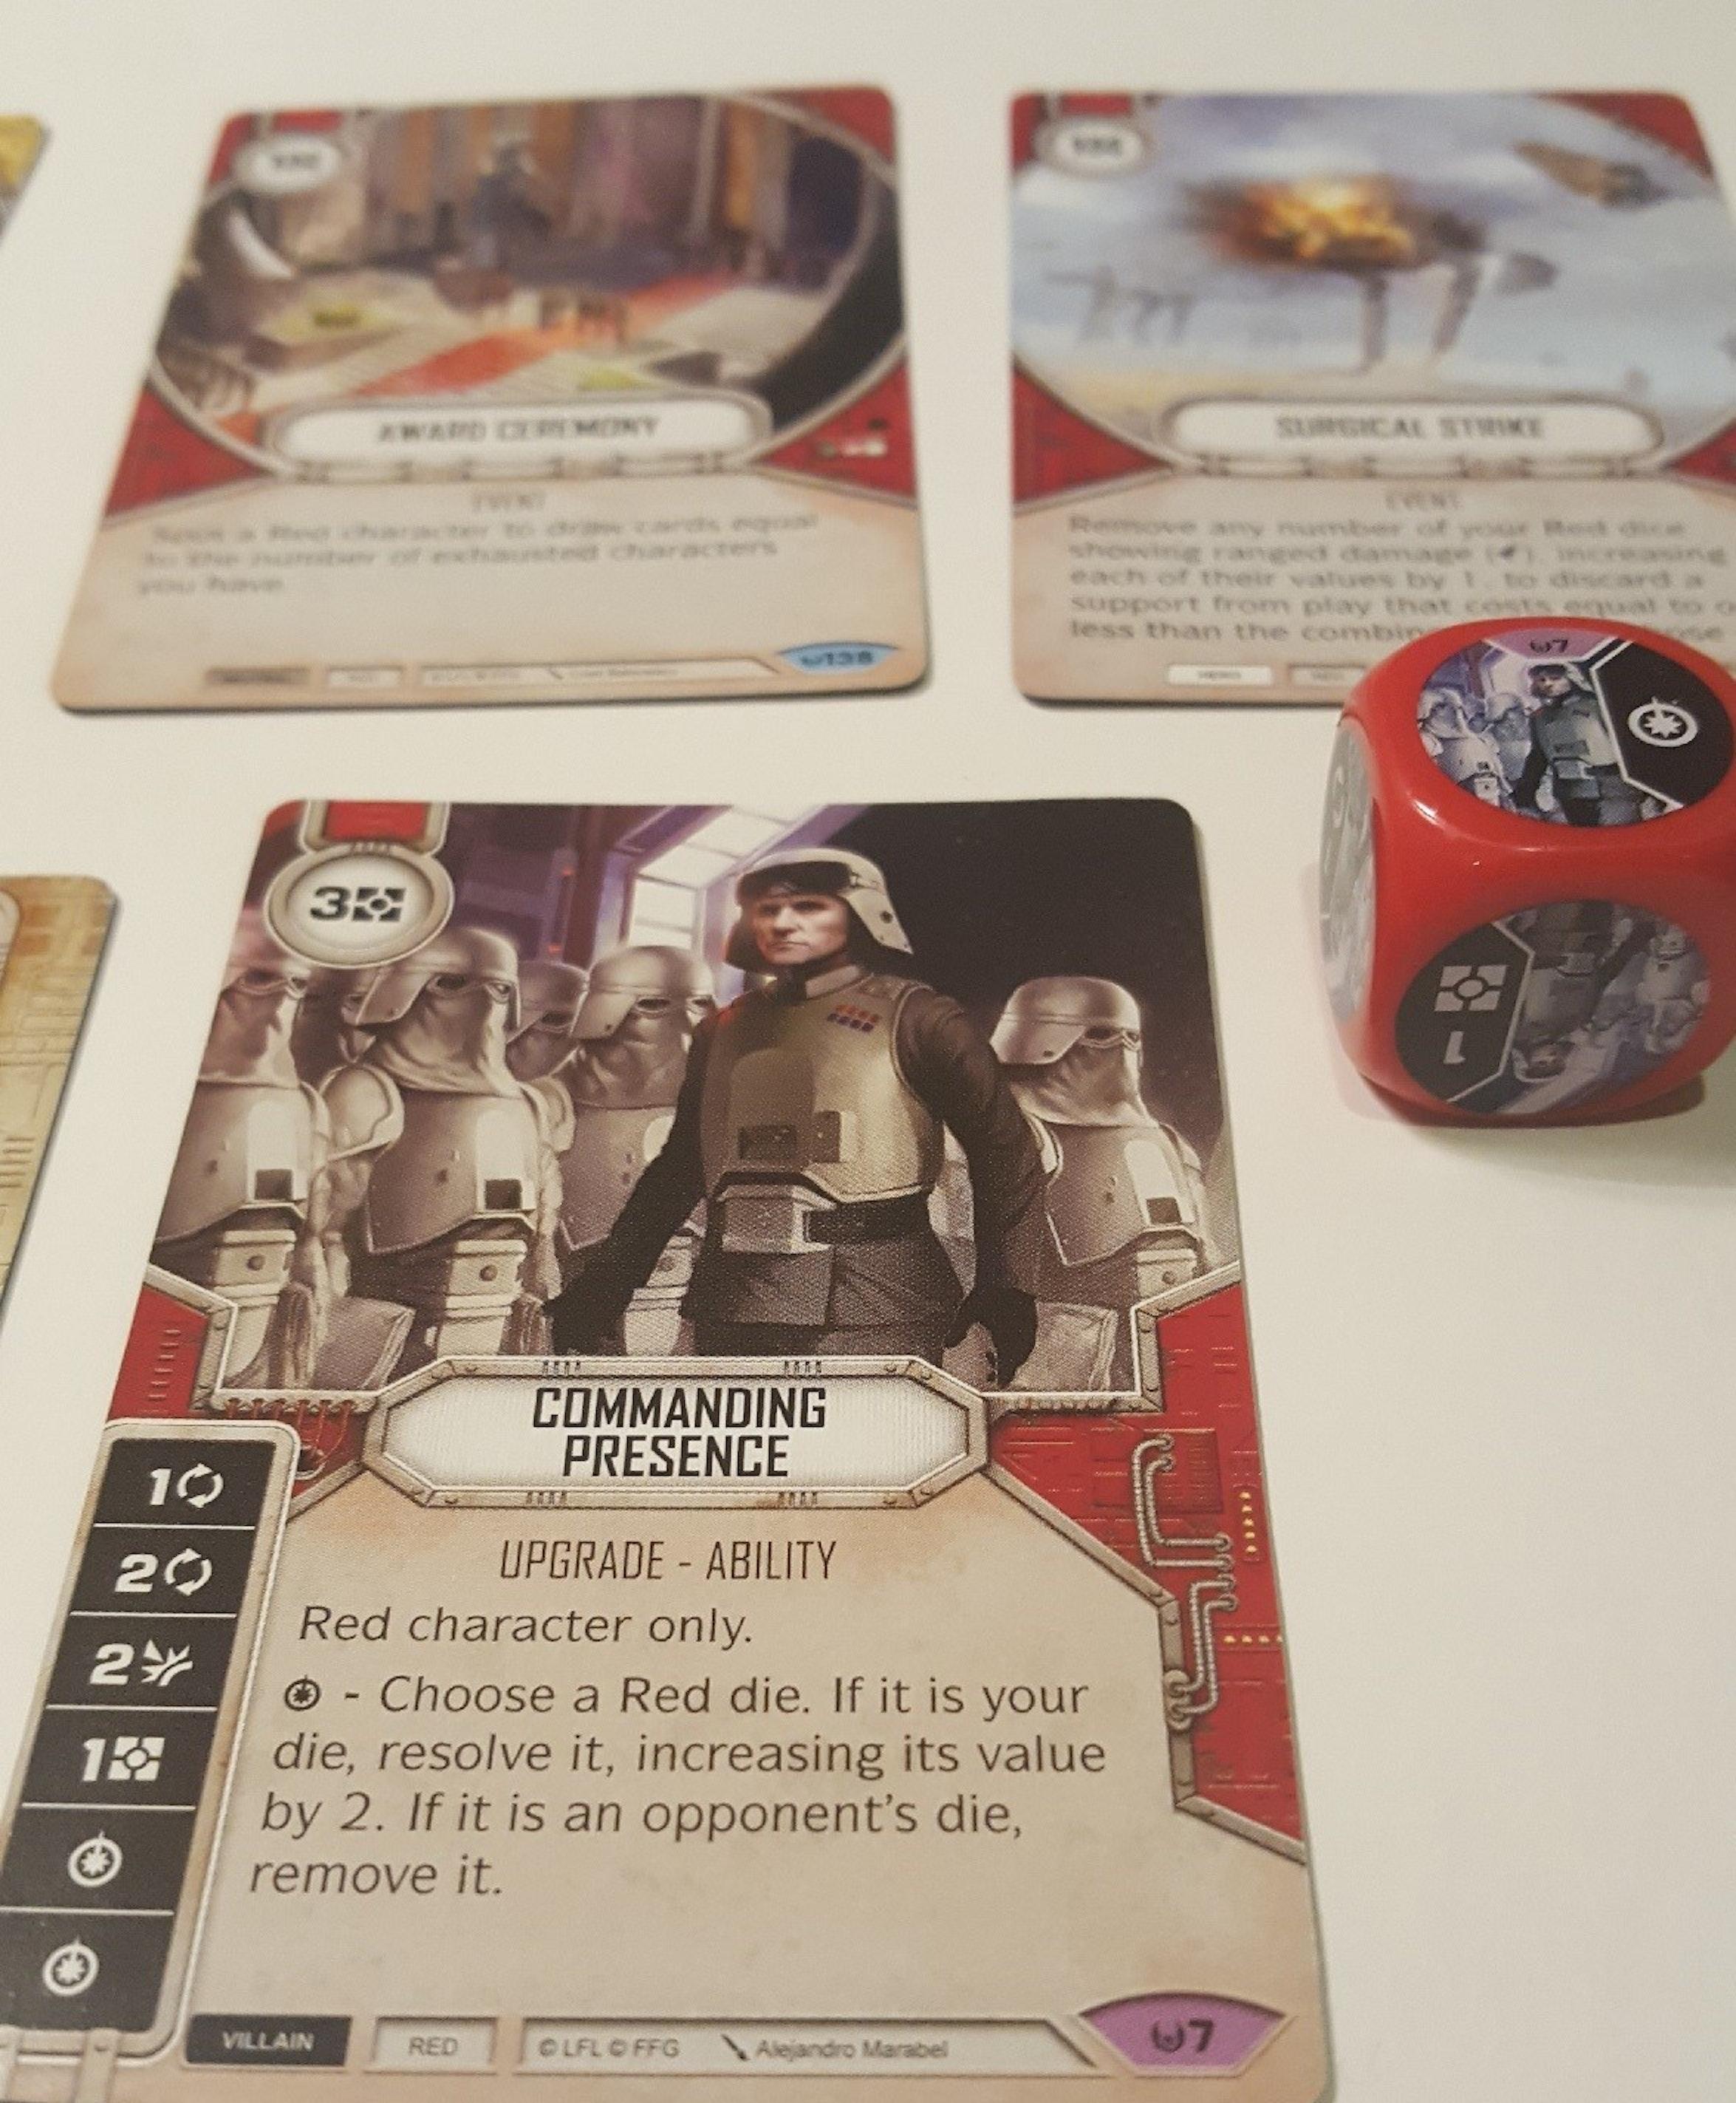 This card seems ... good? General Maximilian Veers, everyone.